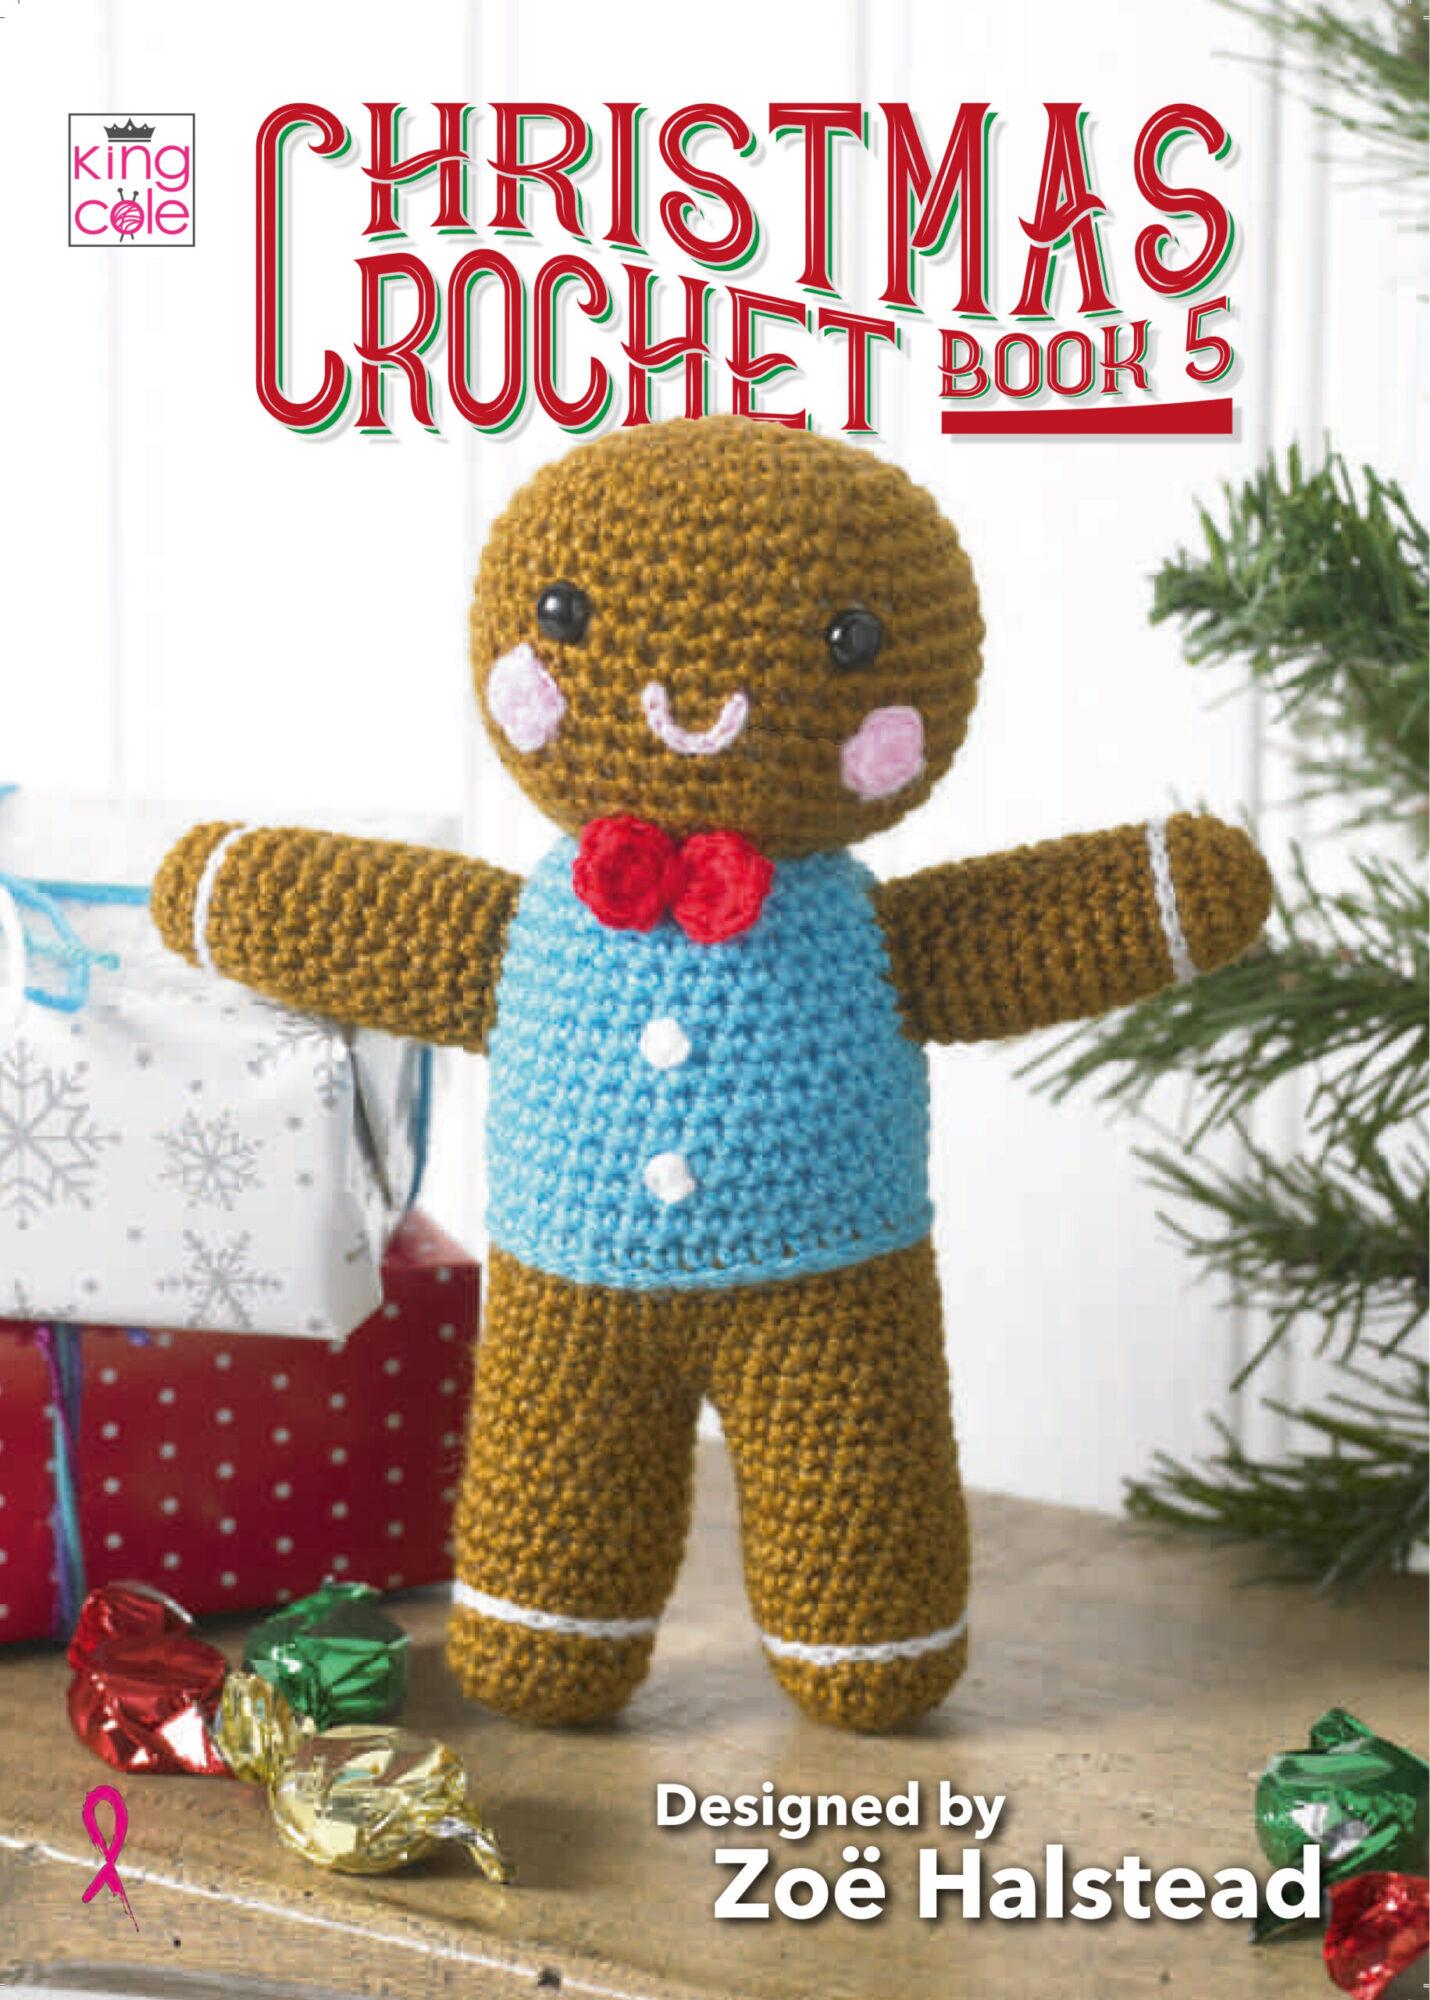 King Cole Christmas Crochet – Book 5 product image